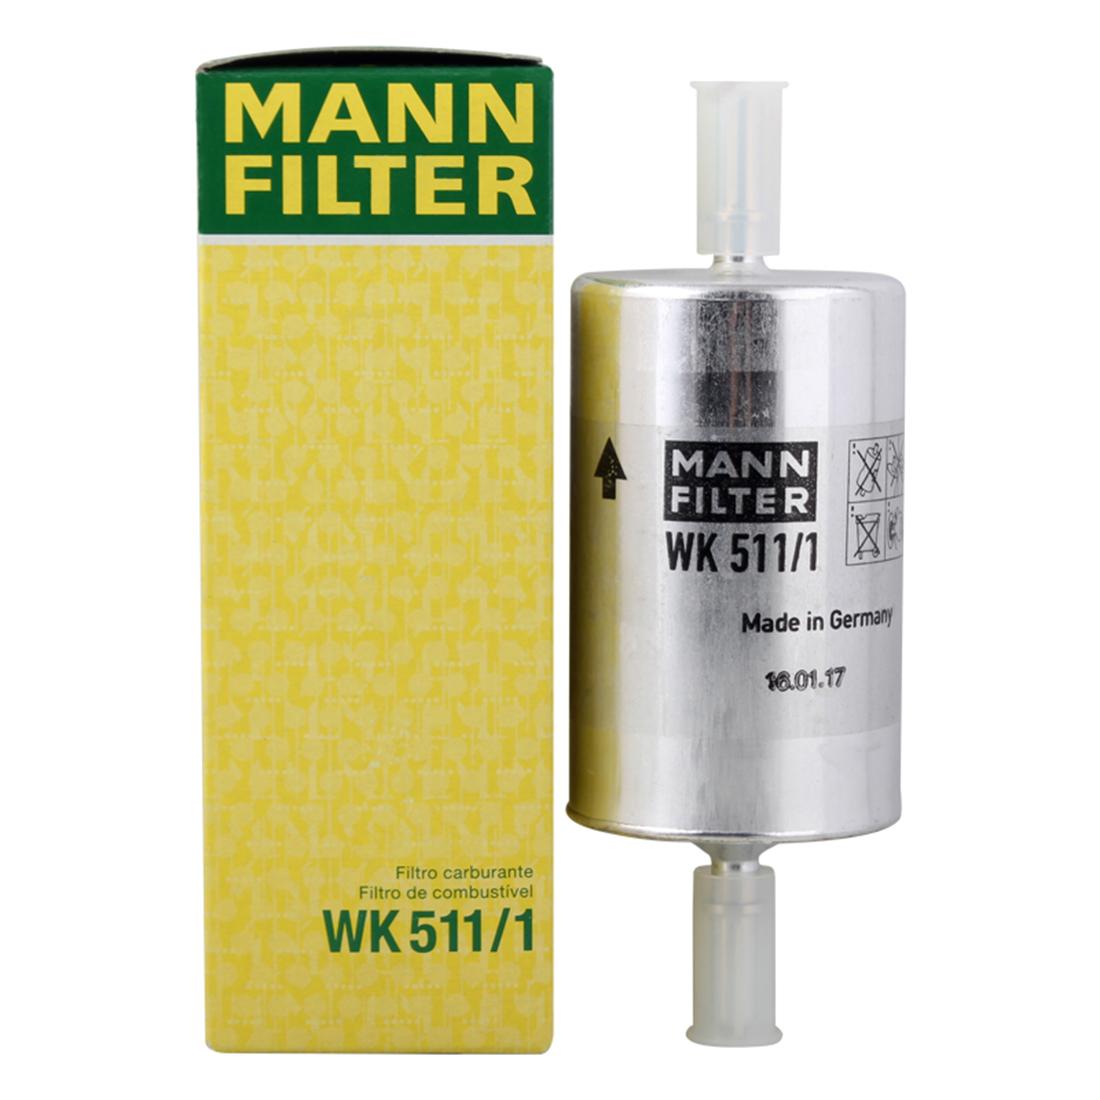 MANN Fuel Filter WK511/1 For Mercedes Benz 6394770011 4011558944001  Ml Fuel Filter Location on ml320 transmission fluid location, 2000 ml320 gas gauge fuse location, ml320 gas line filter, ml320 catalytic converter location, ml320 crankshaft sensor location, ml320 fuel pump fuse on, ml320 fuel pressure regulator, dodge durango gas filter location, mercedes-benz e320 fuel pump location,